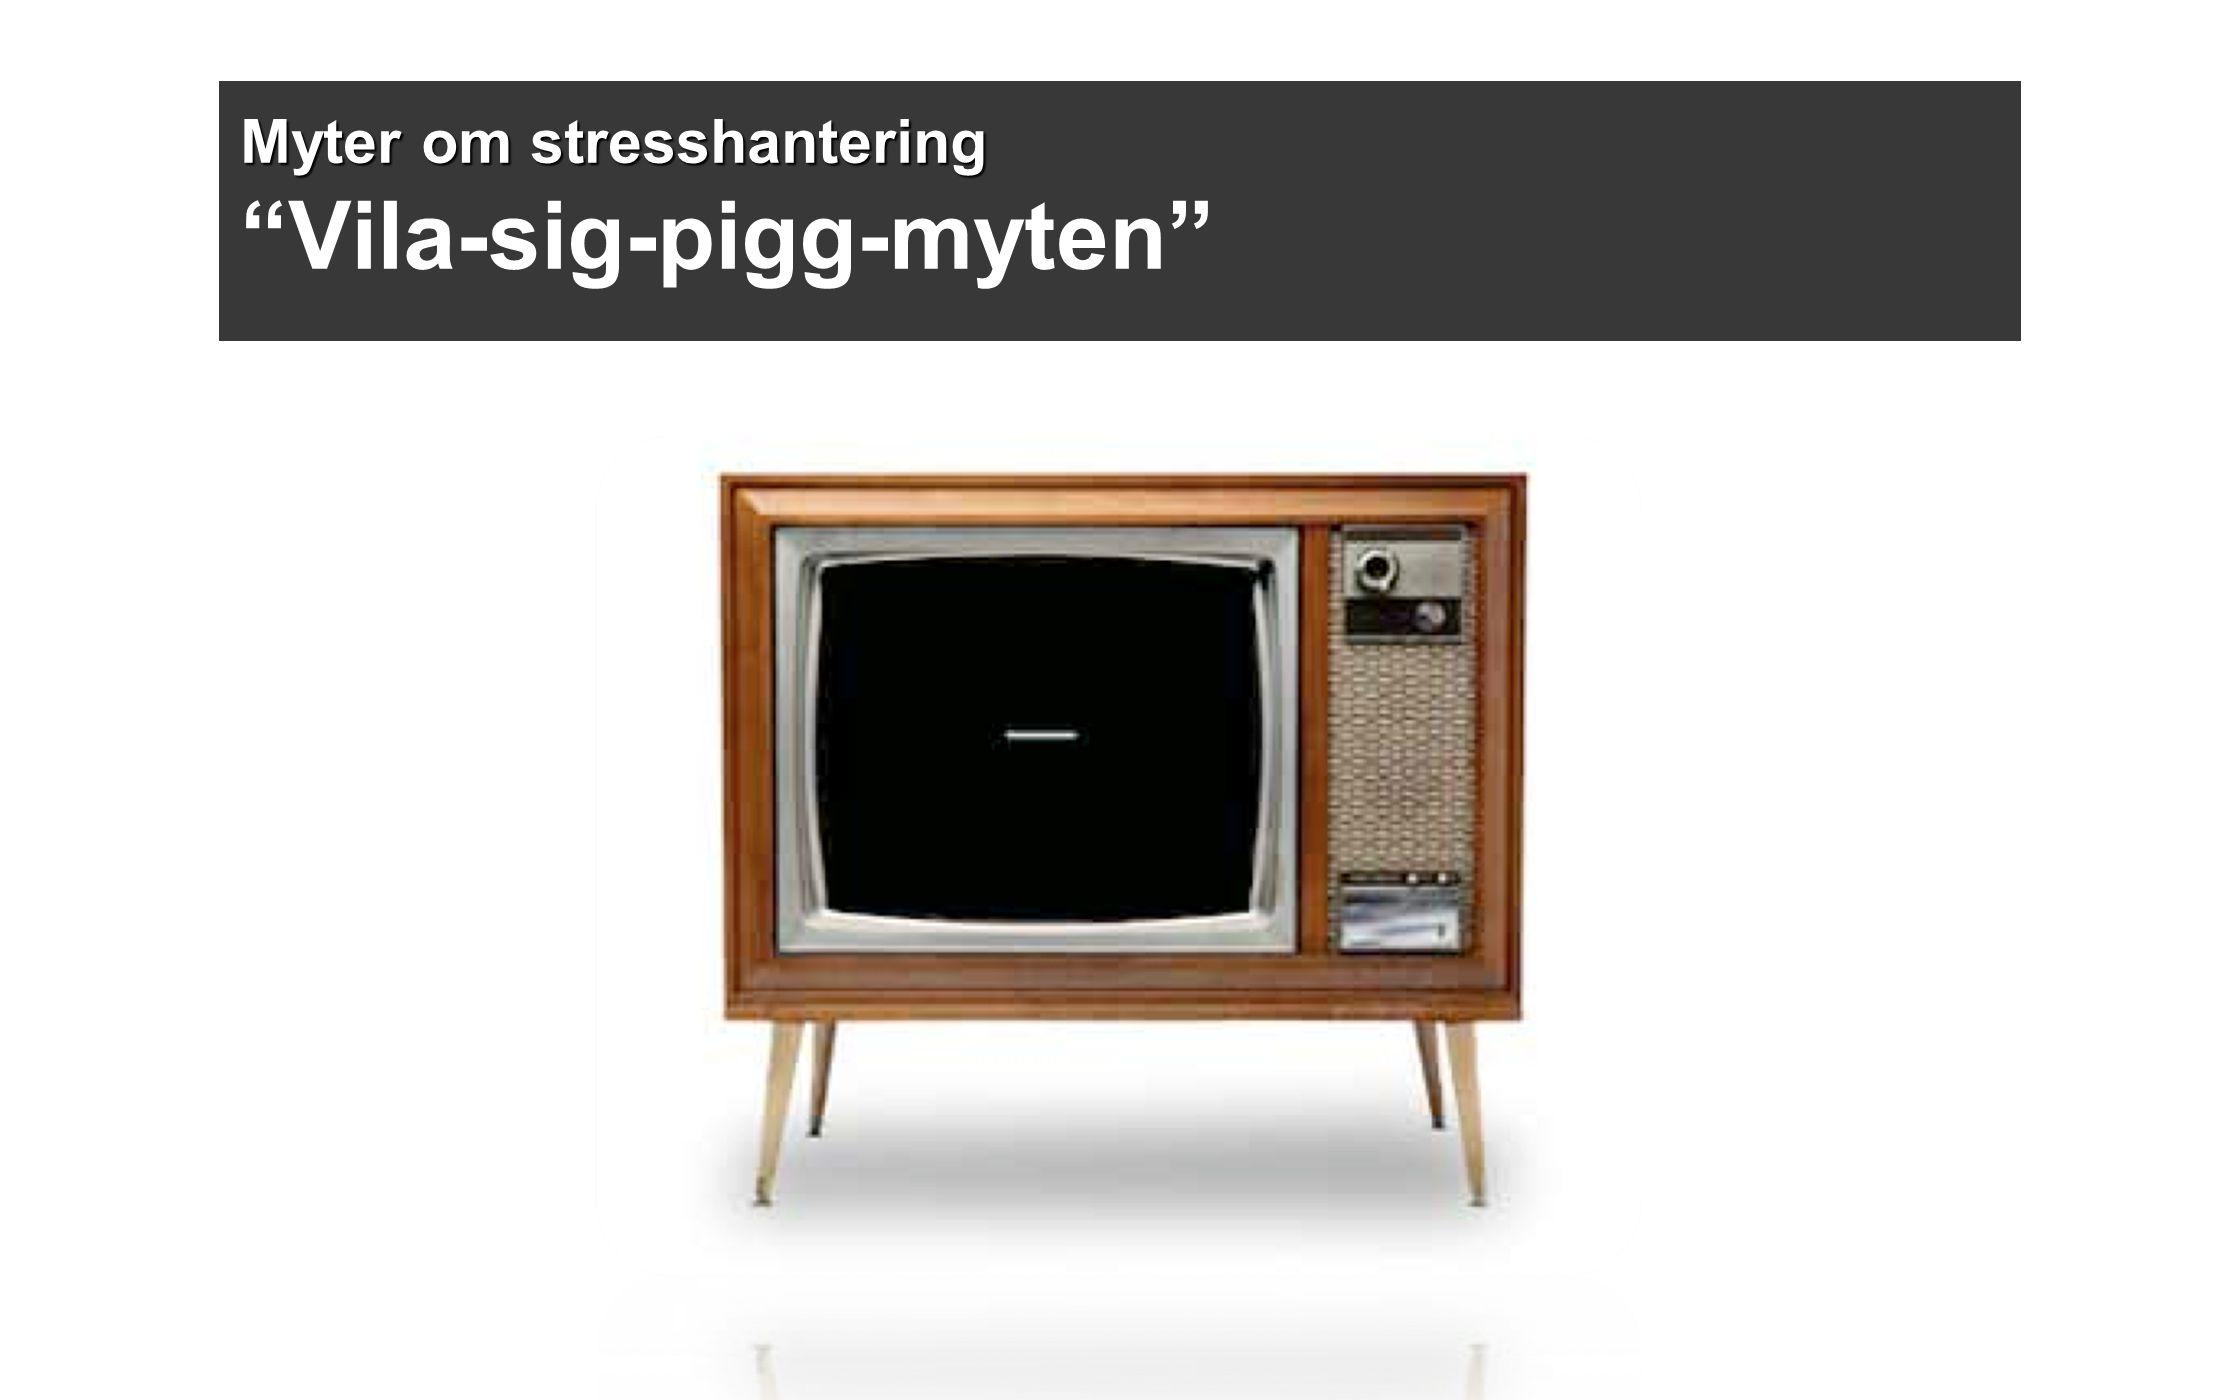 Myter om stresshantering Vila-sig-pigg-myten